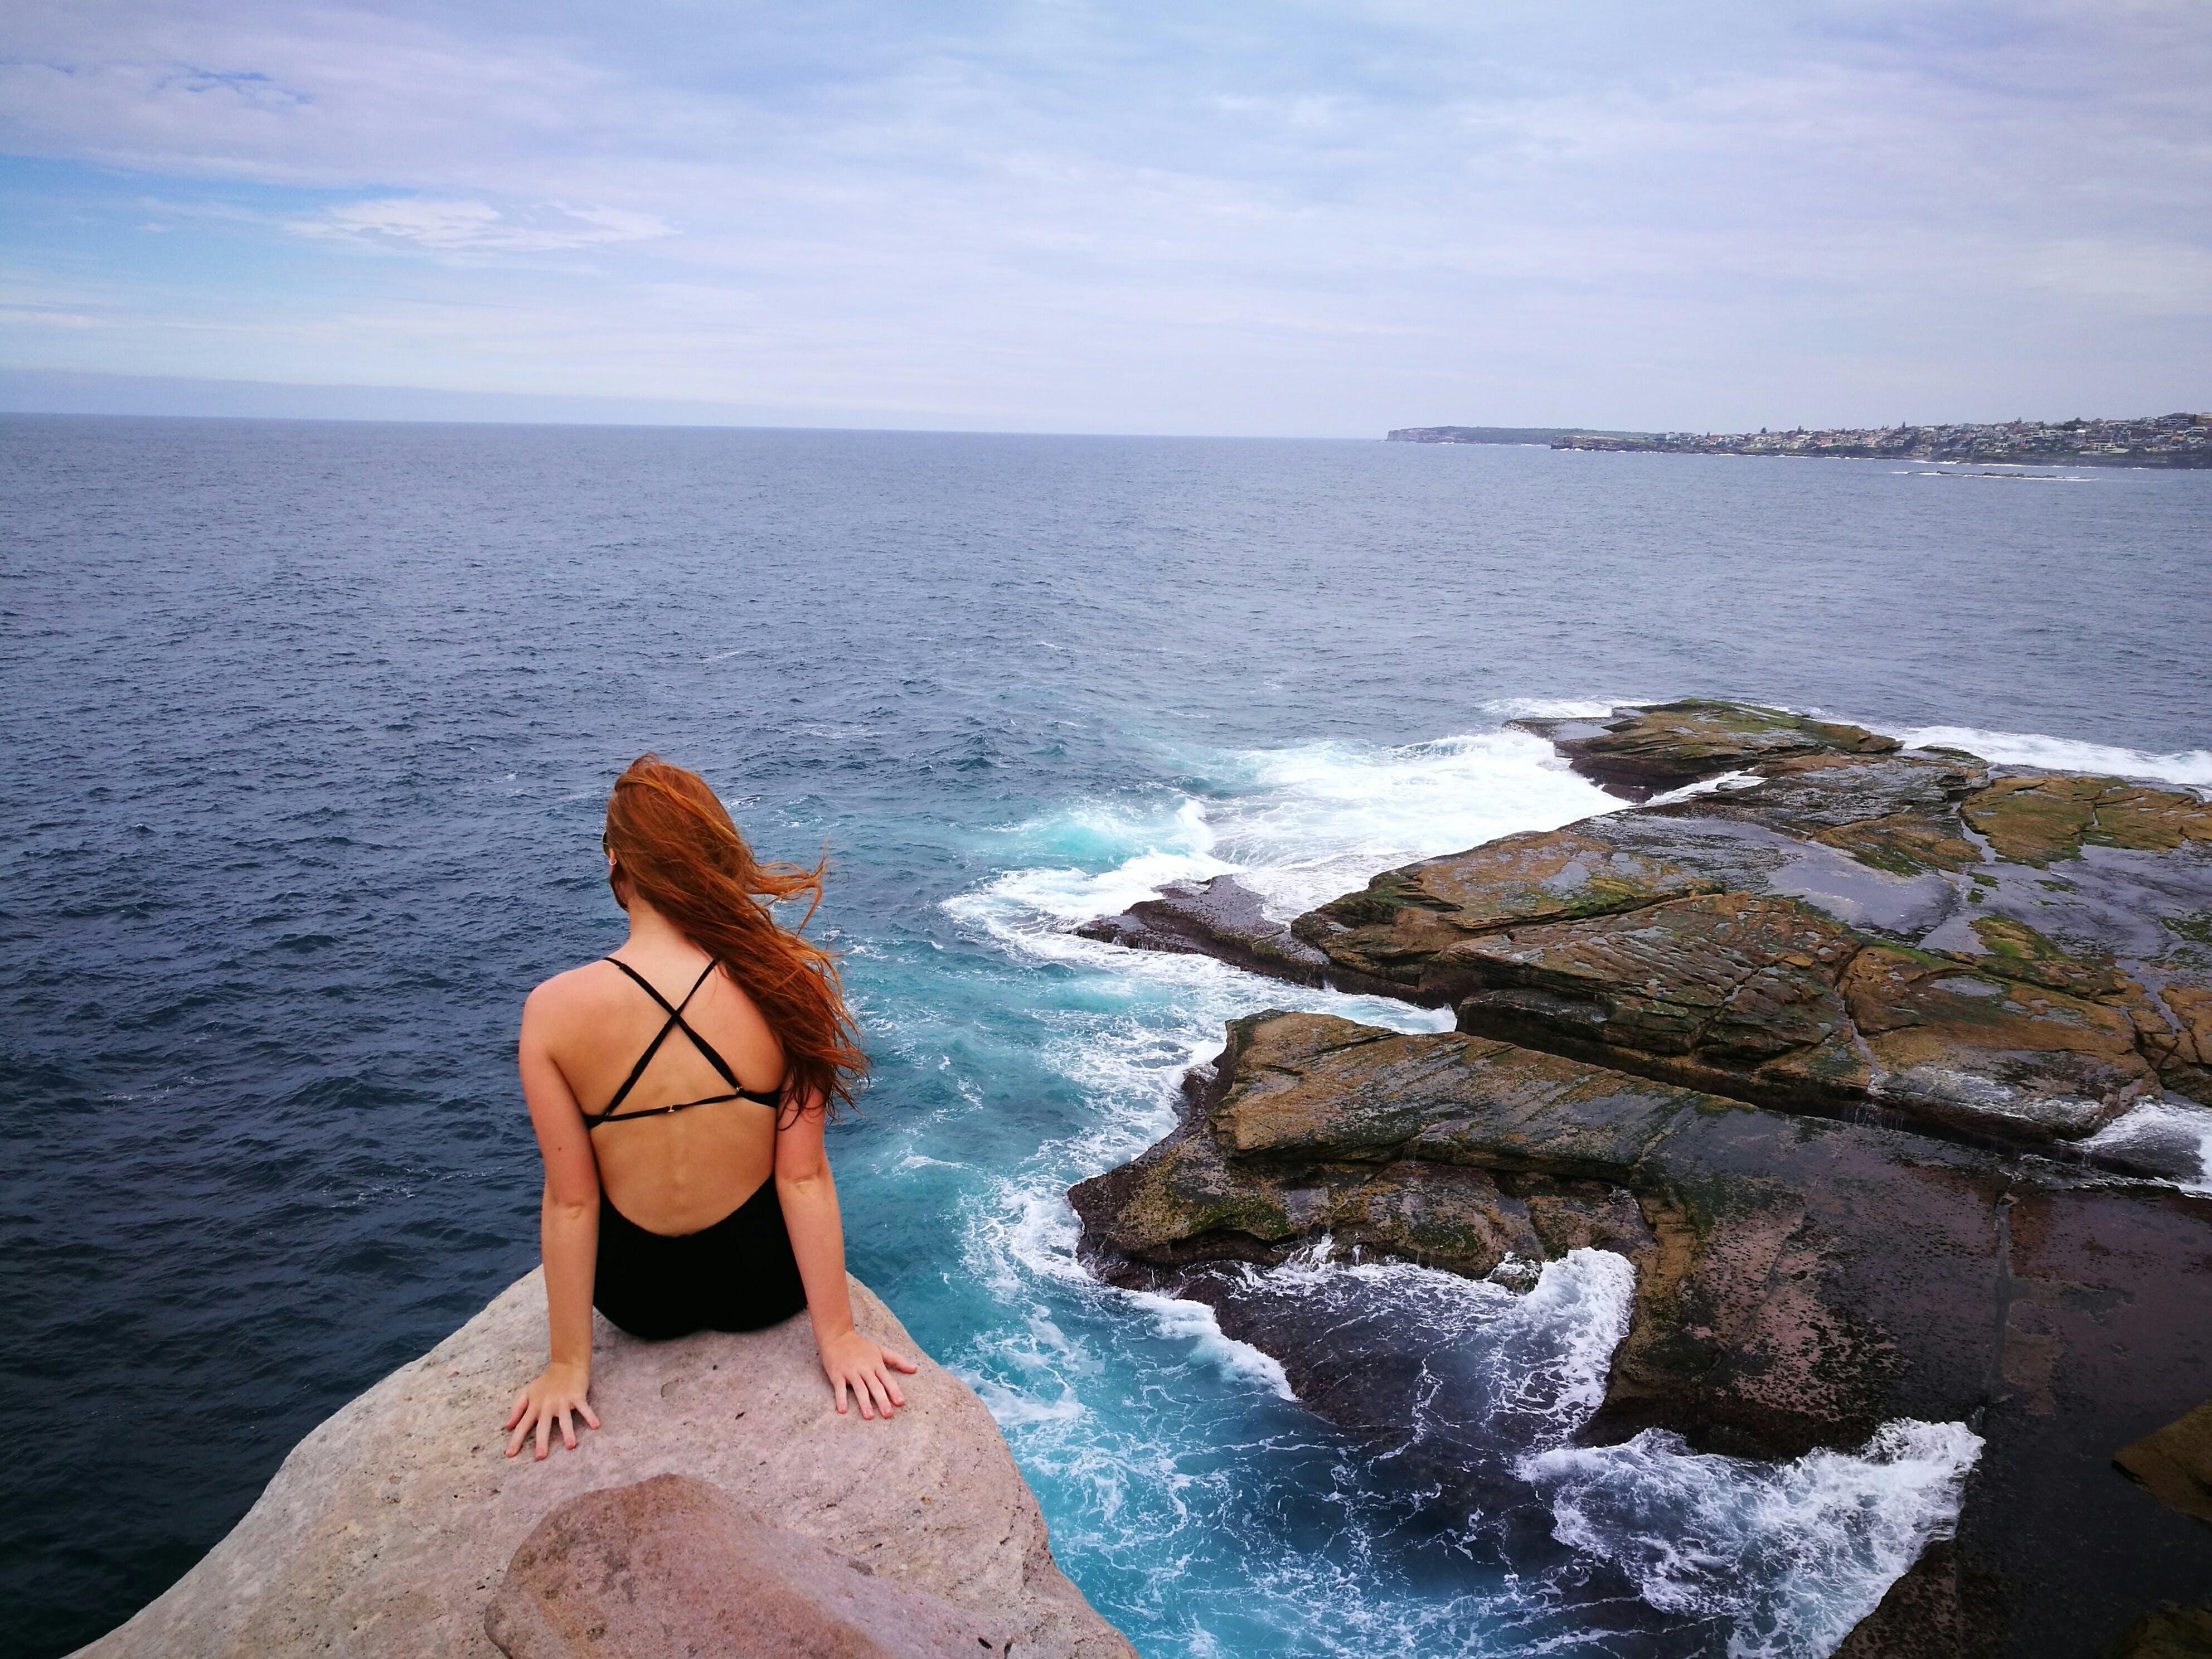 Woman Wearing Monokini on Rock Cliff Near Body of water